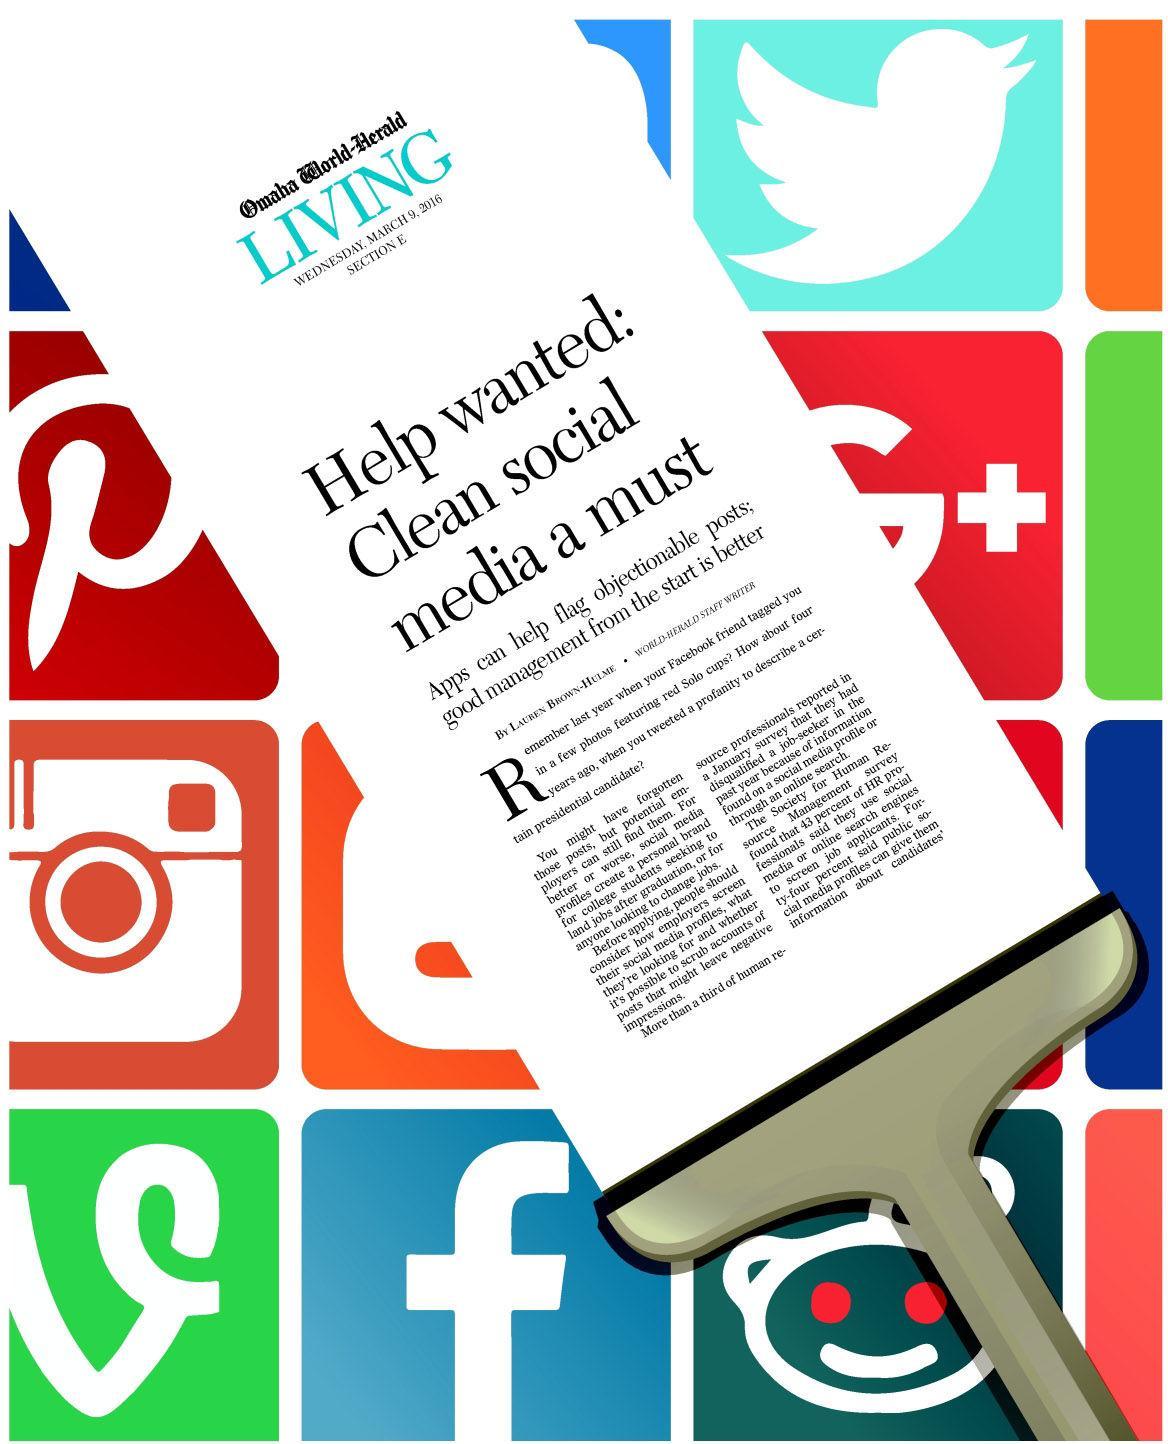 Help wanted: Clean social media a must | Articles | omaha com